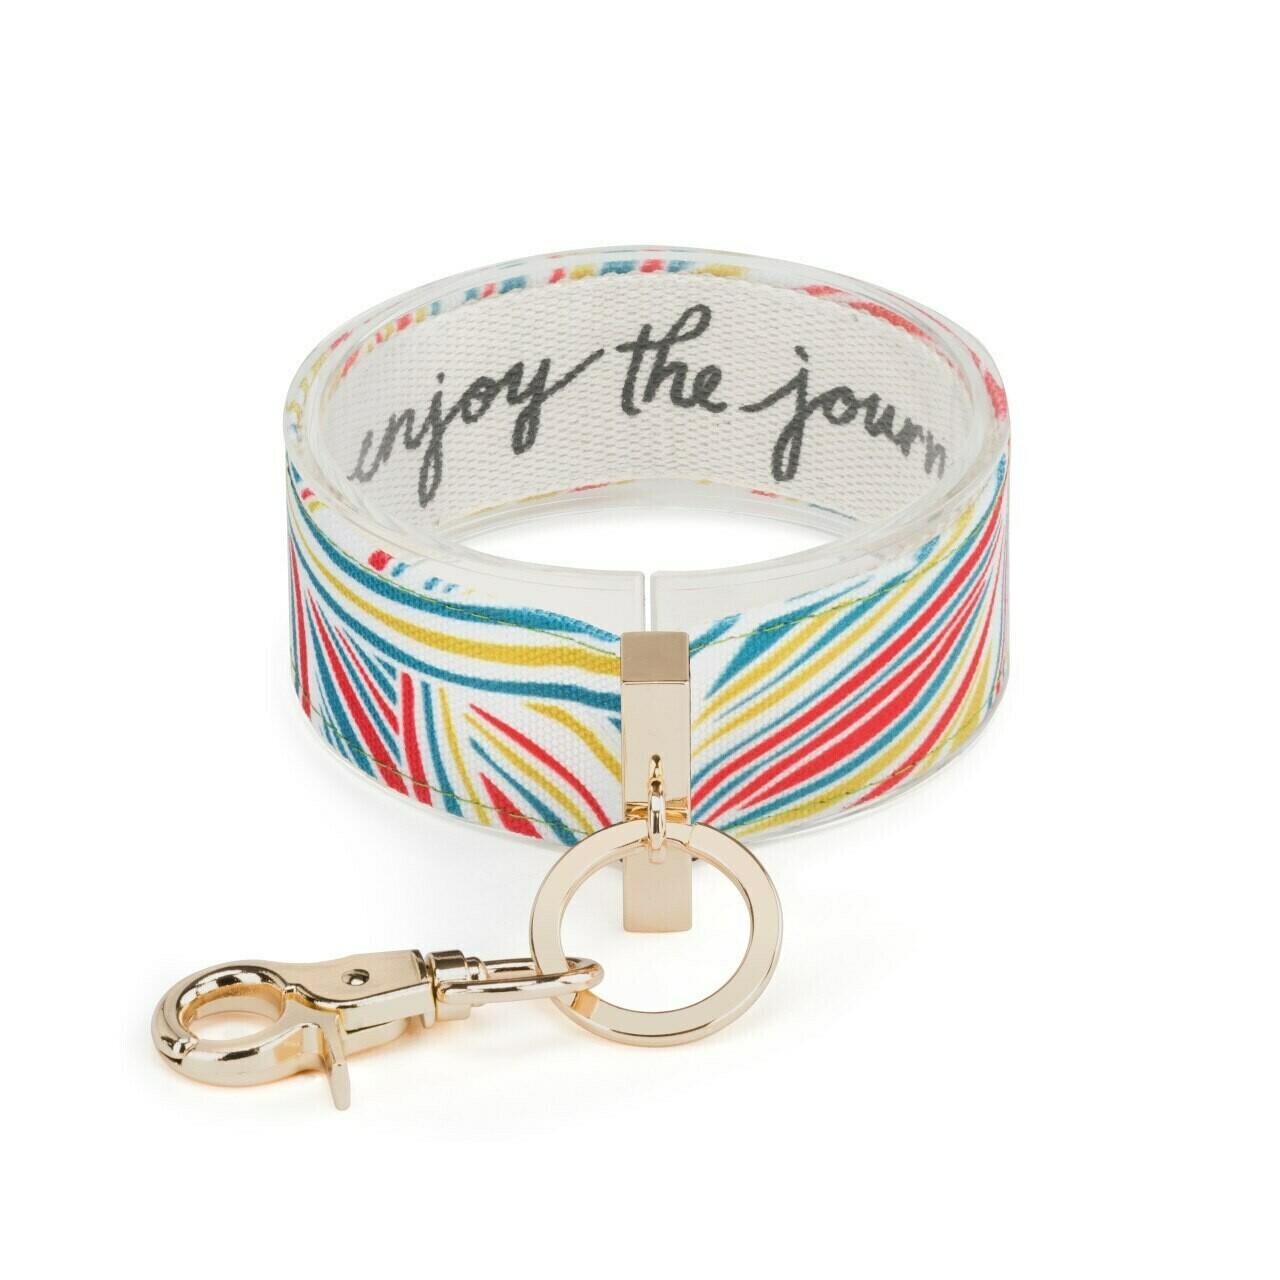 Demdaco Wrist Strap Key Ring ENJOY THE JOURNEY